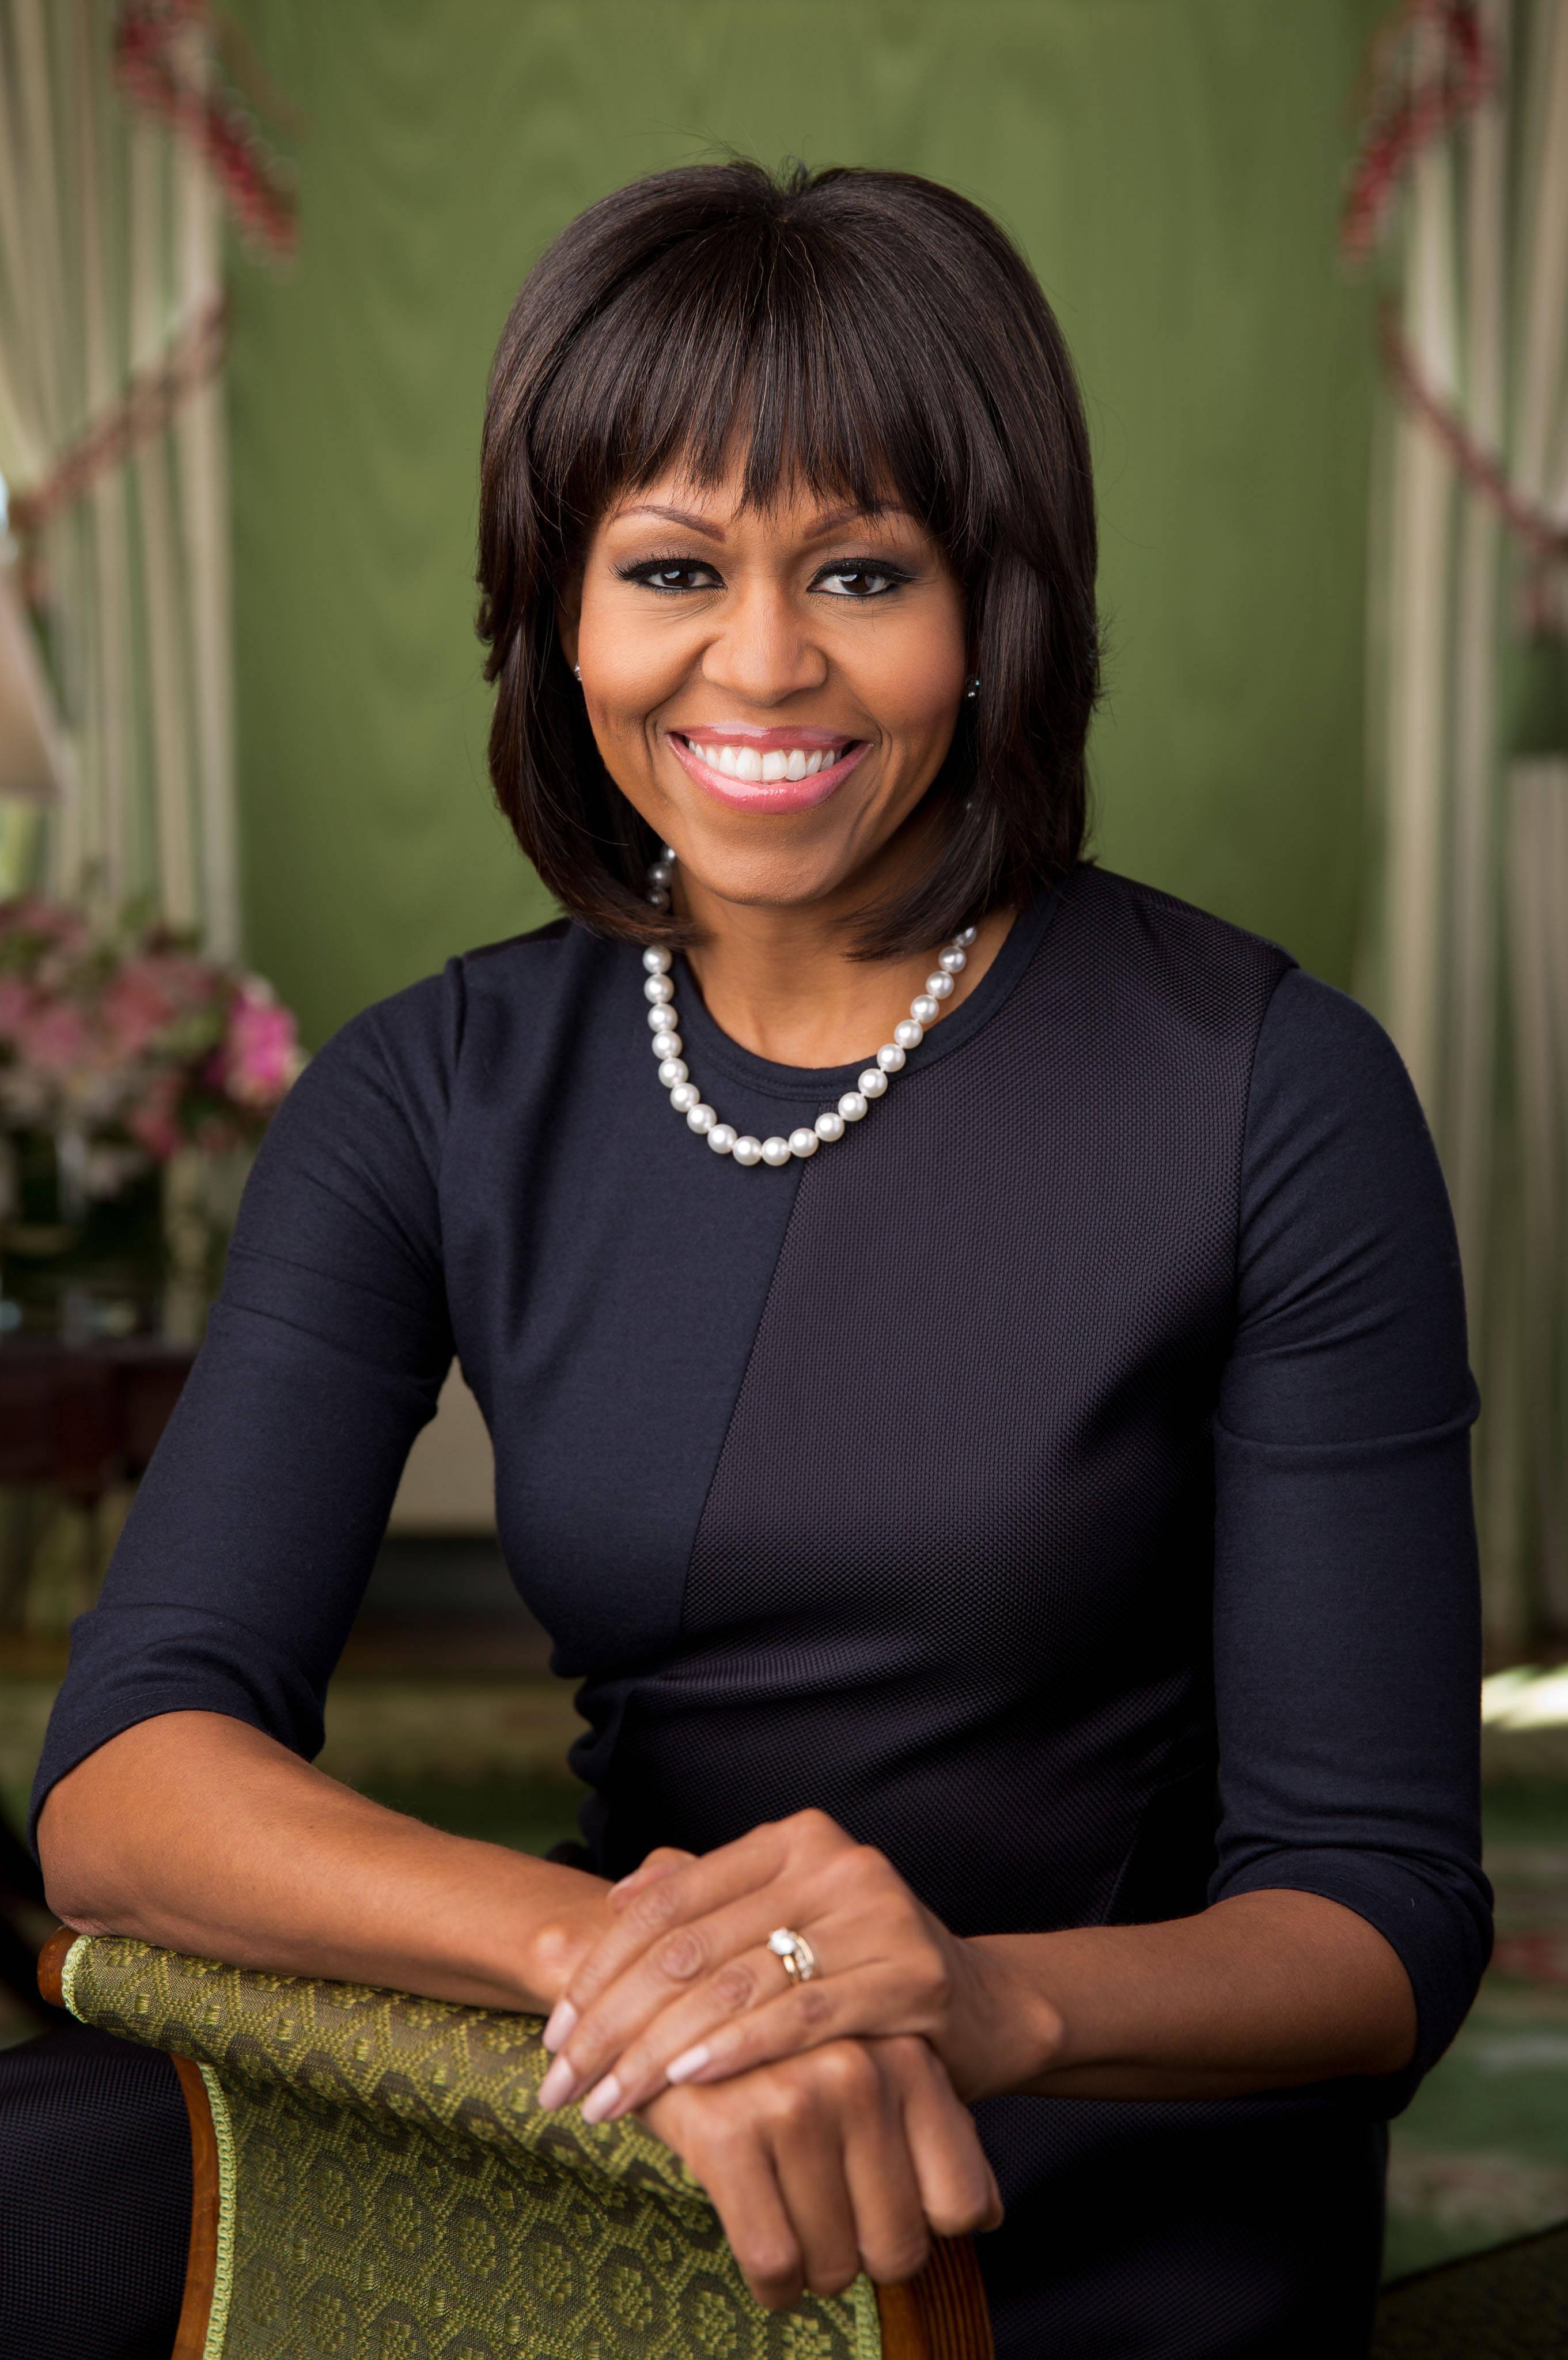 702ee5c84338d916c0ee_Michelle_Obama.jpg